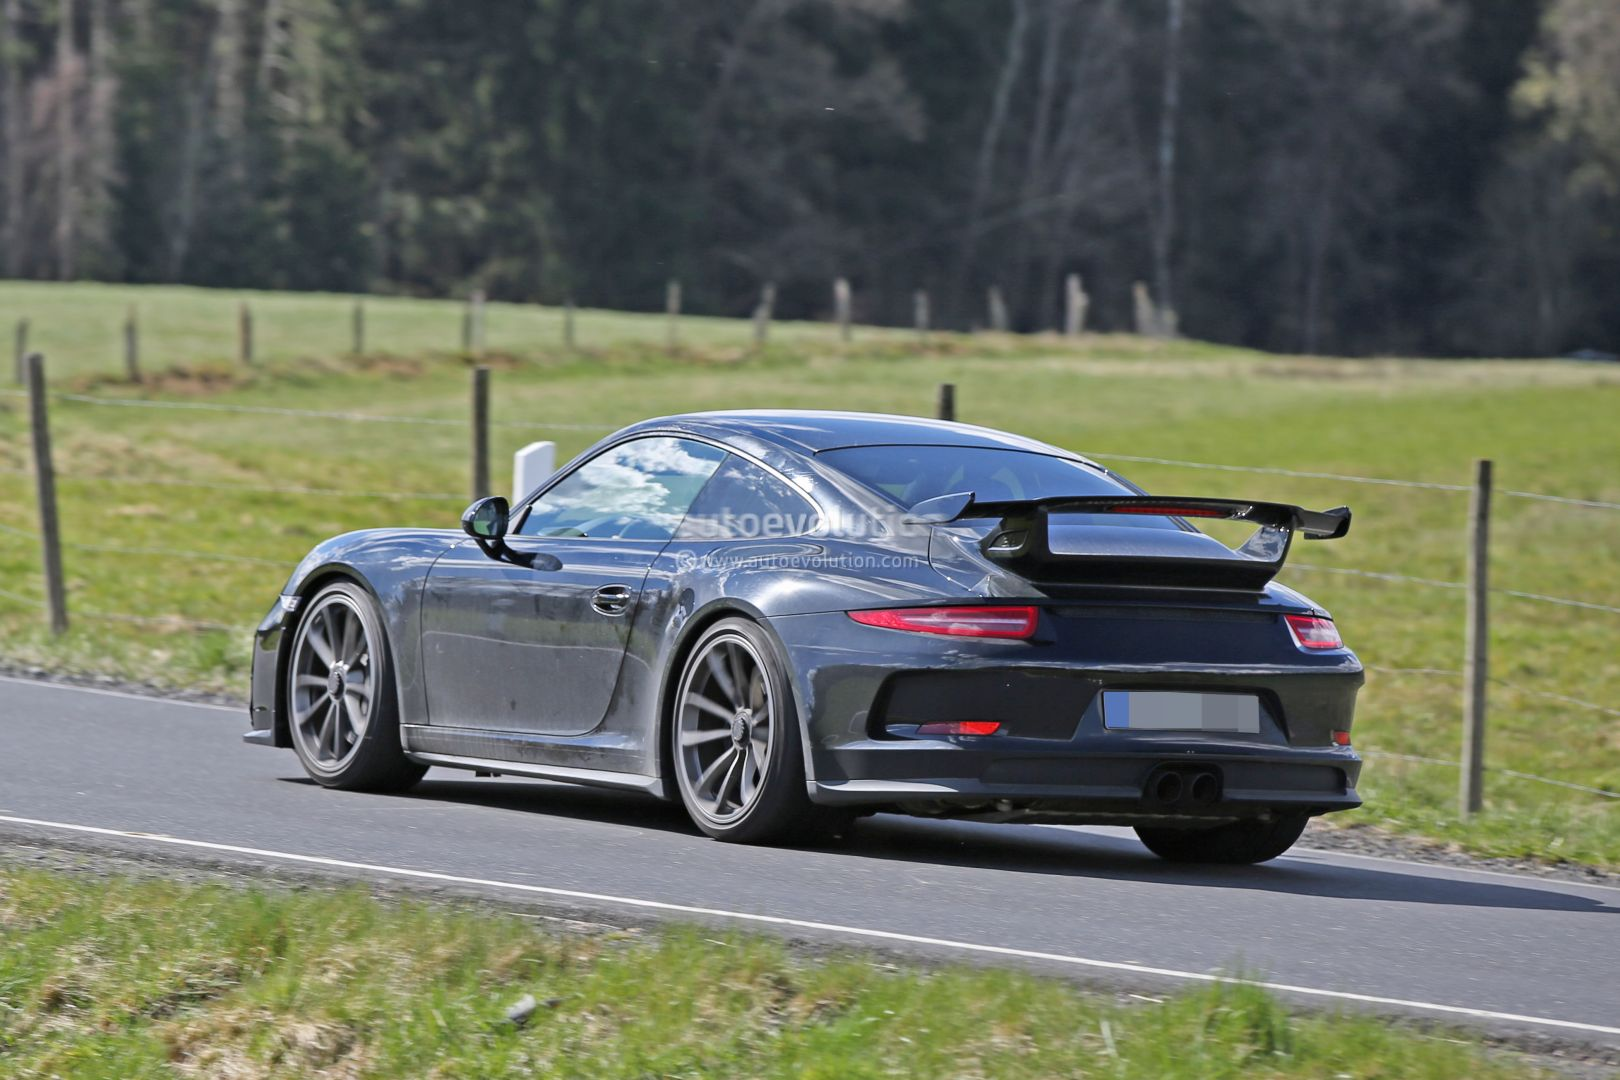 2017 porsche 911 gt3 spied on nurburgring to get 911 r 6 speed manual